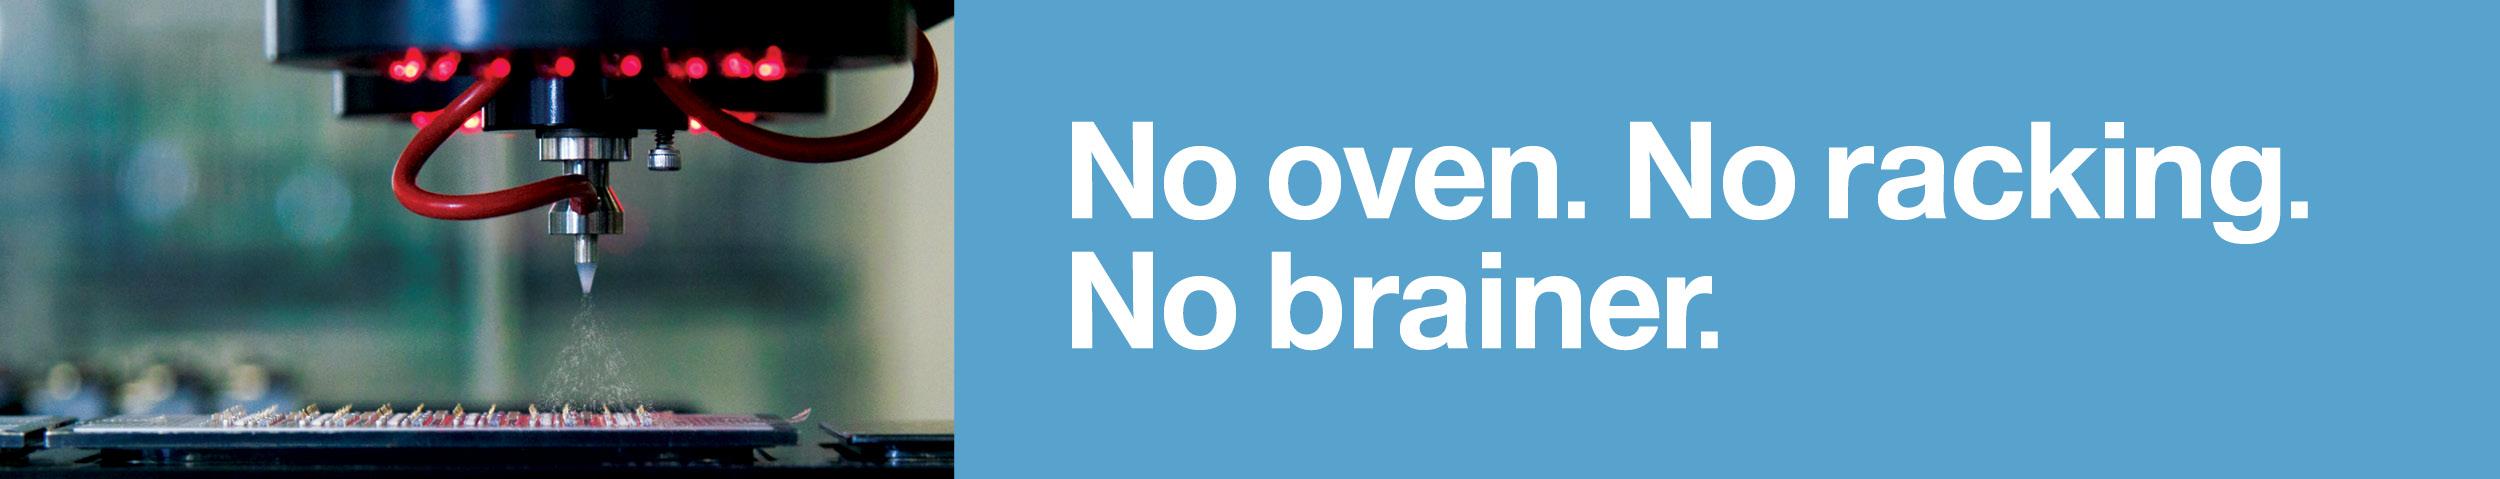 No Oven. No Racking. No Brainer